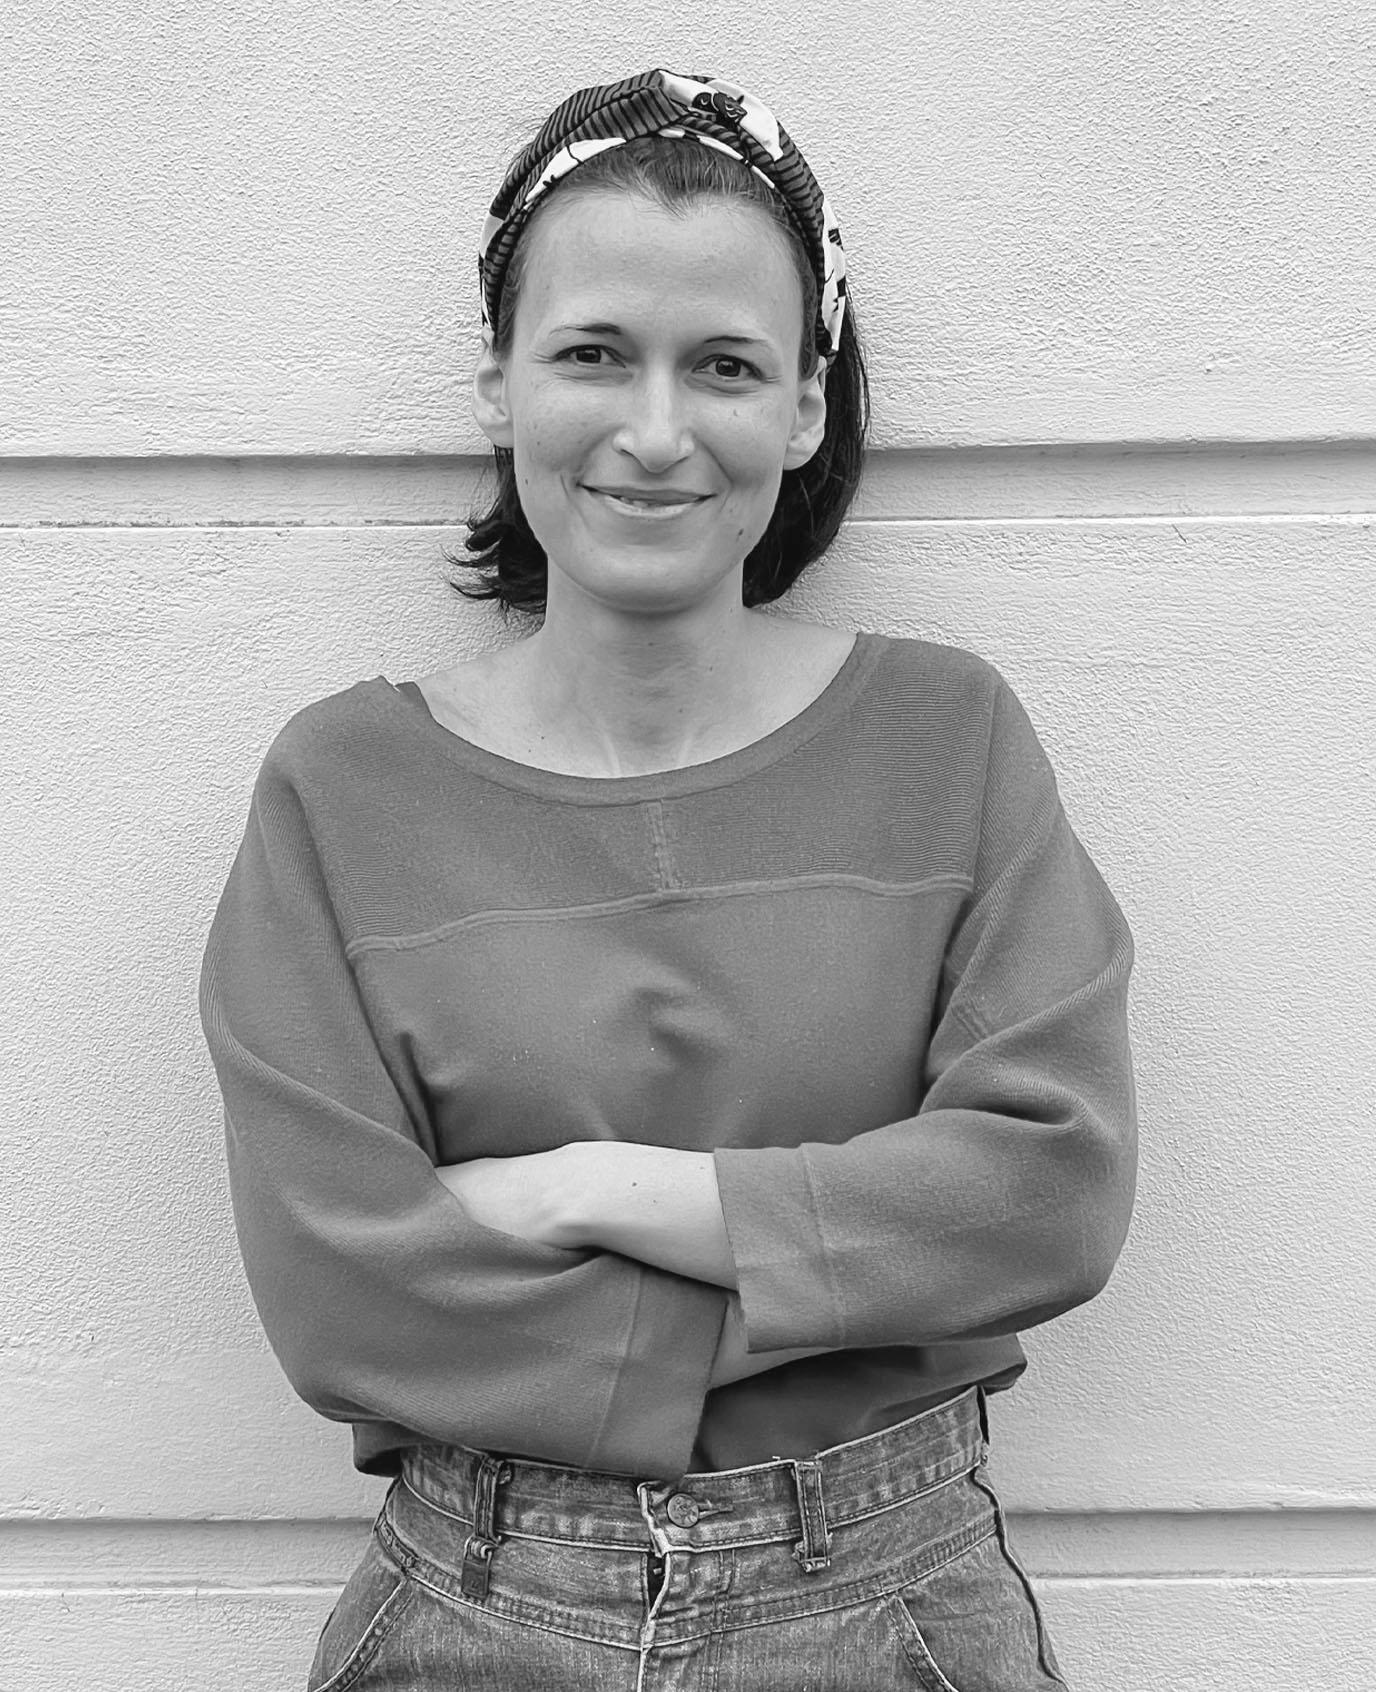 Anna Managò